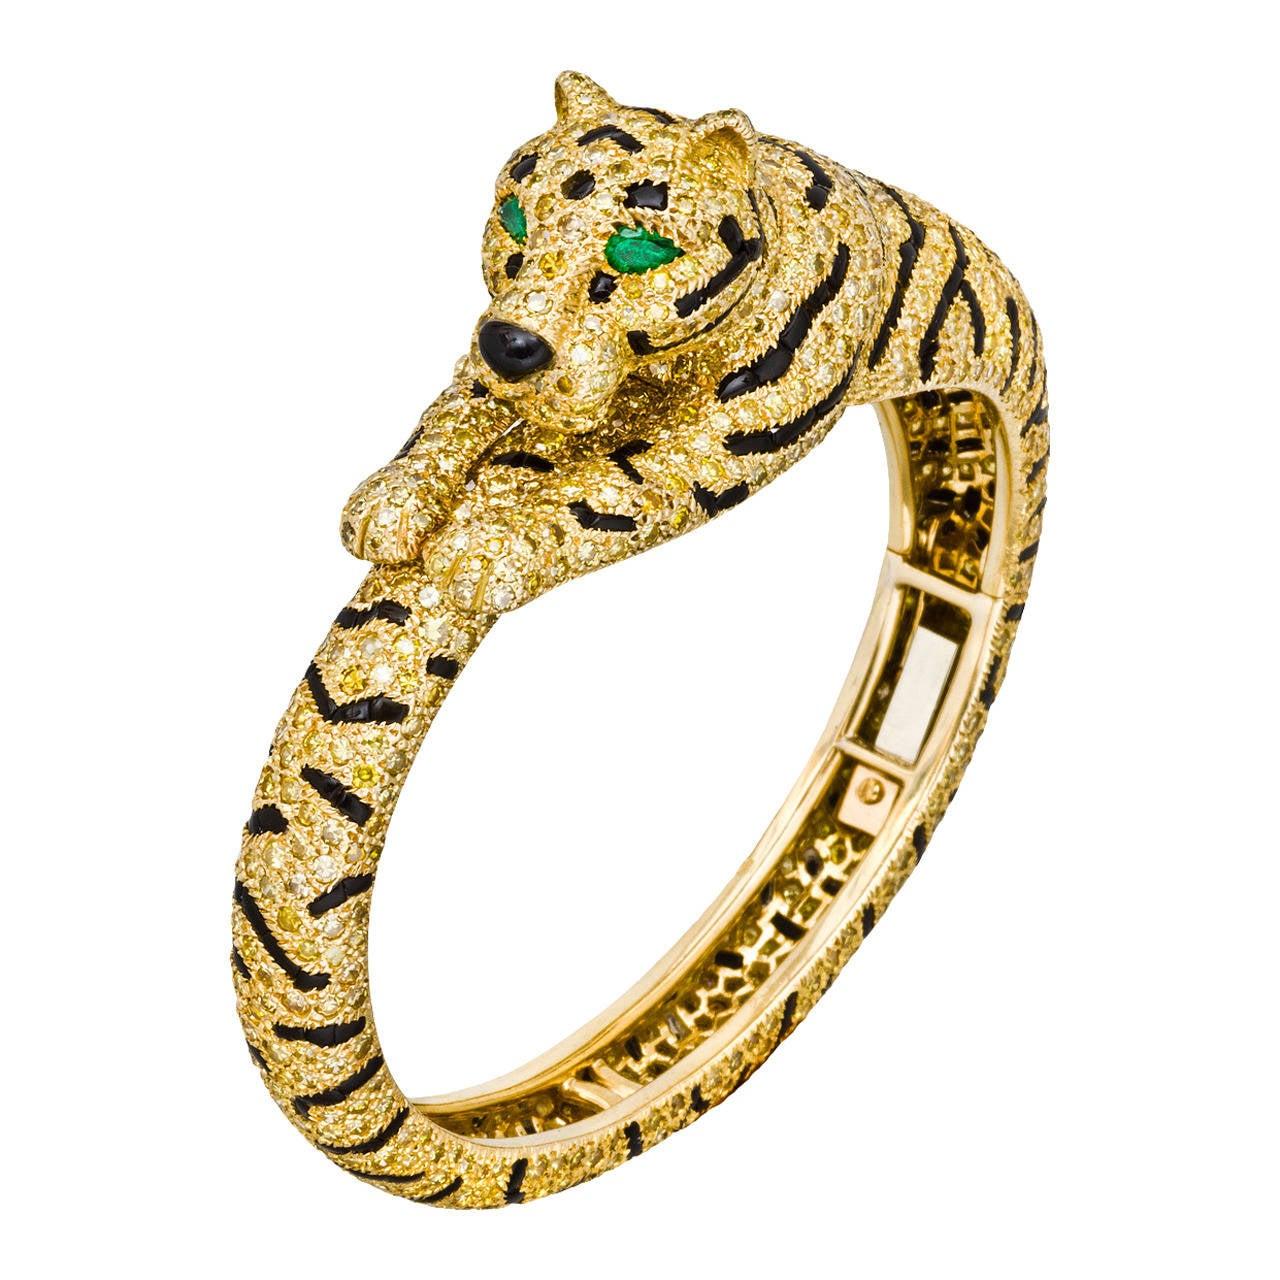 Cartier Onyx Emerald Diamond Gold Tiger Bangle Bracelet At